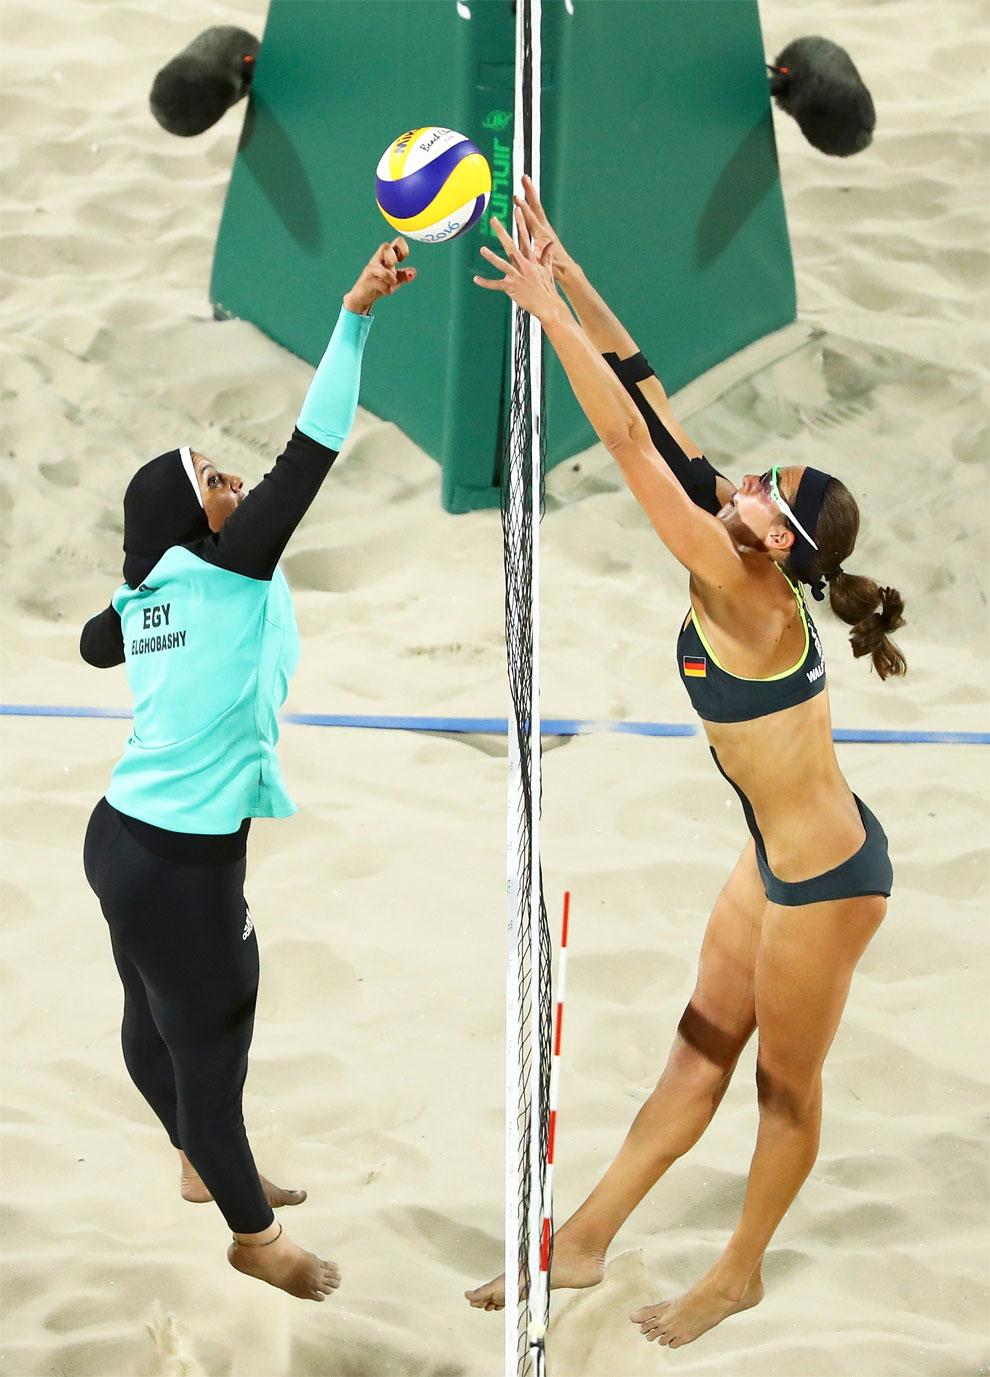 Rio Olympics August 7, 2016.